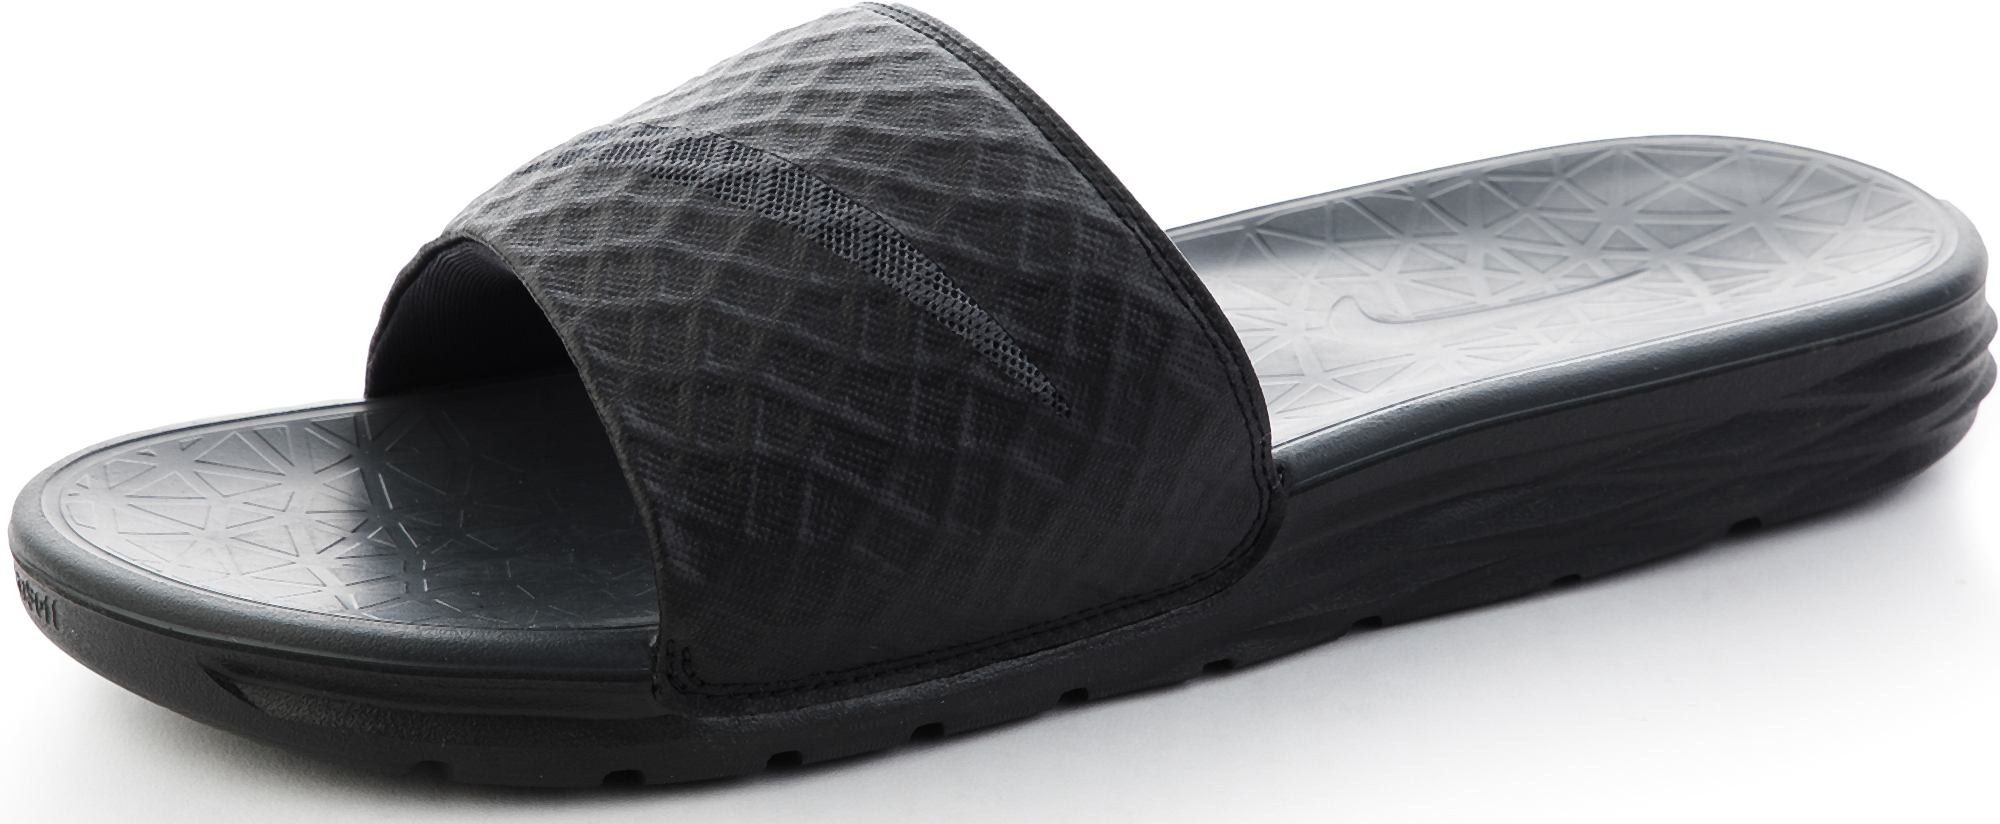 Nike Шлепанцы мужские Nike Benassi Solarsoft, размер 39